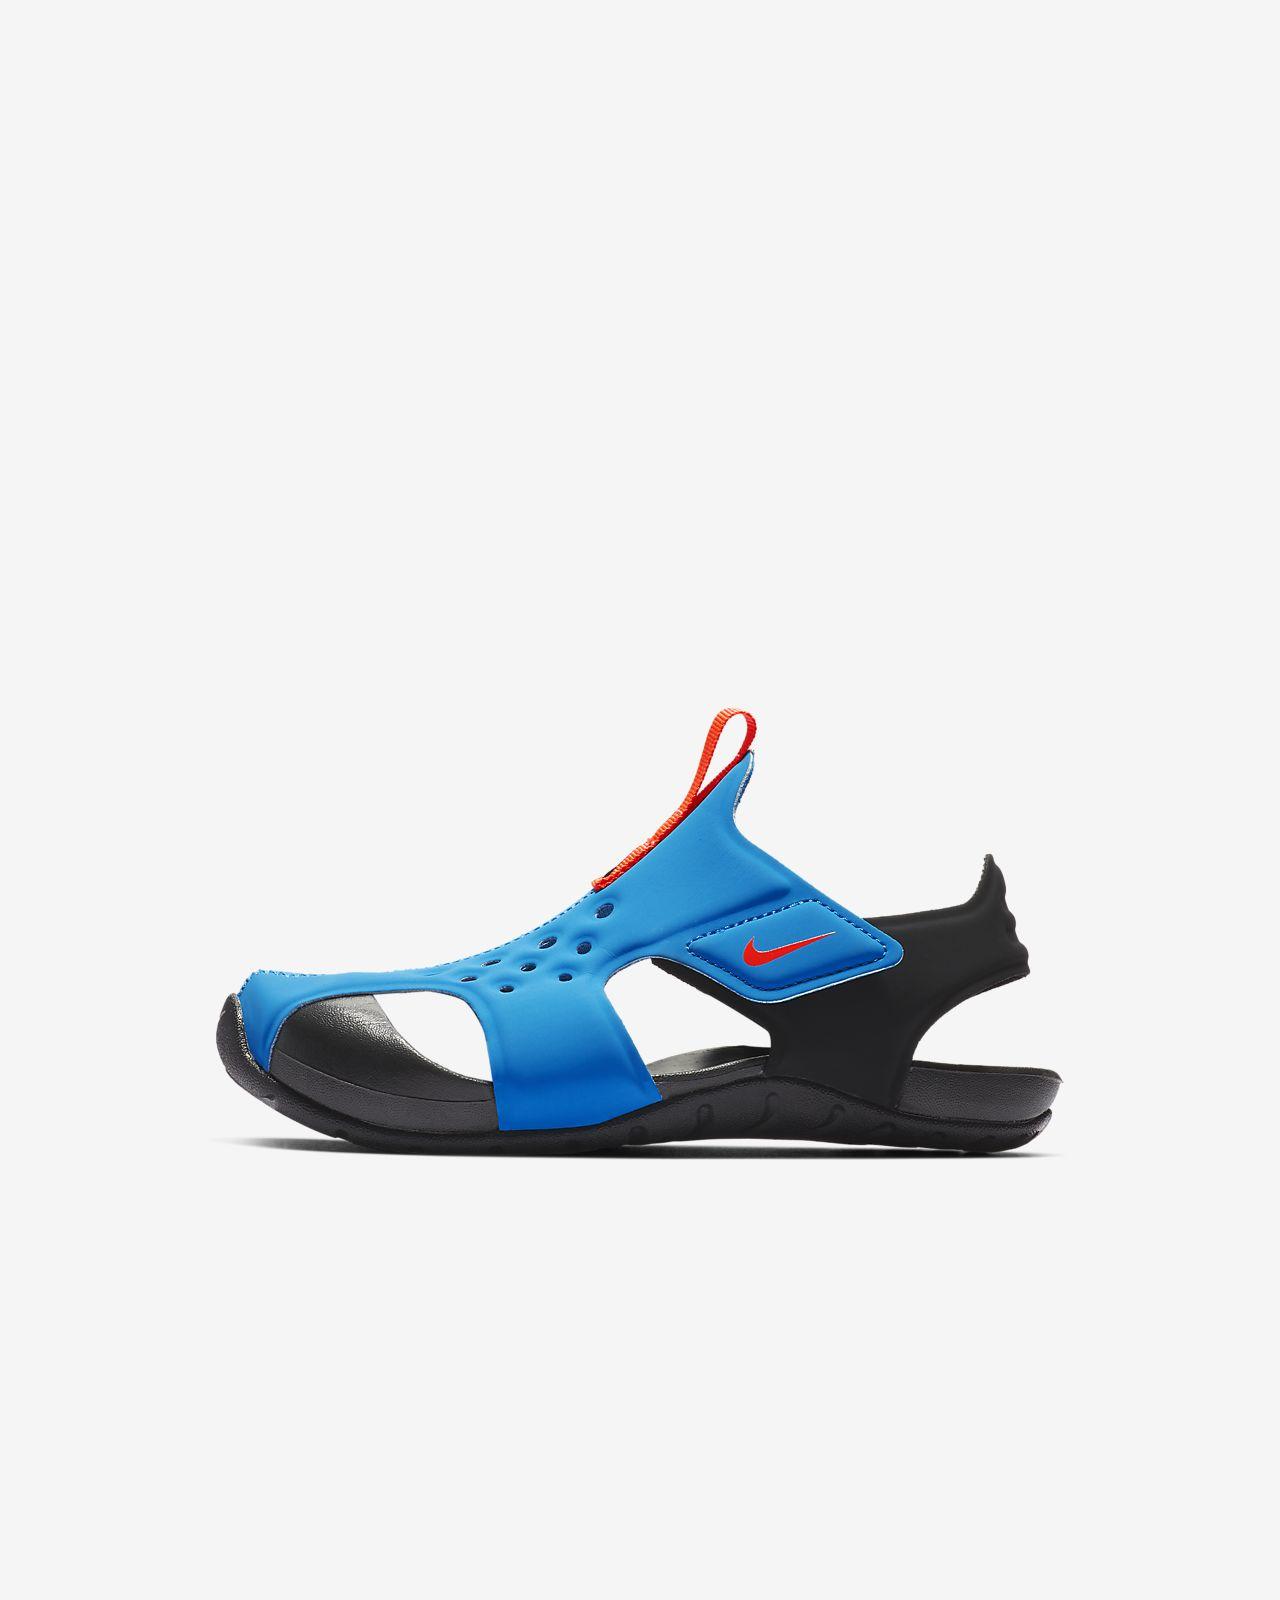 Nike Sunray Protect 2 Little Kids' Sandal